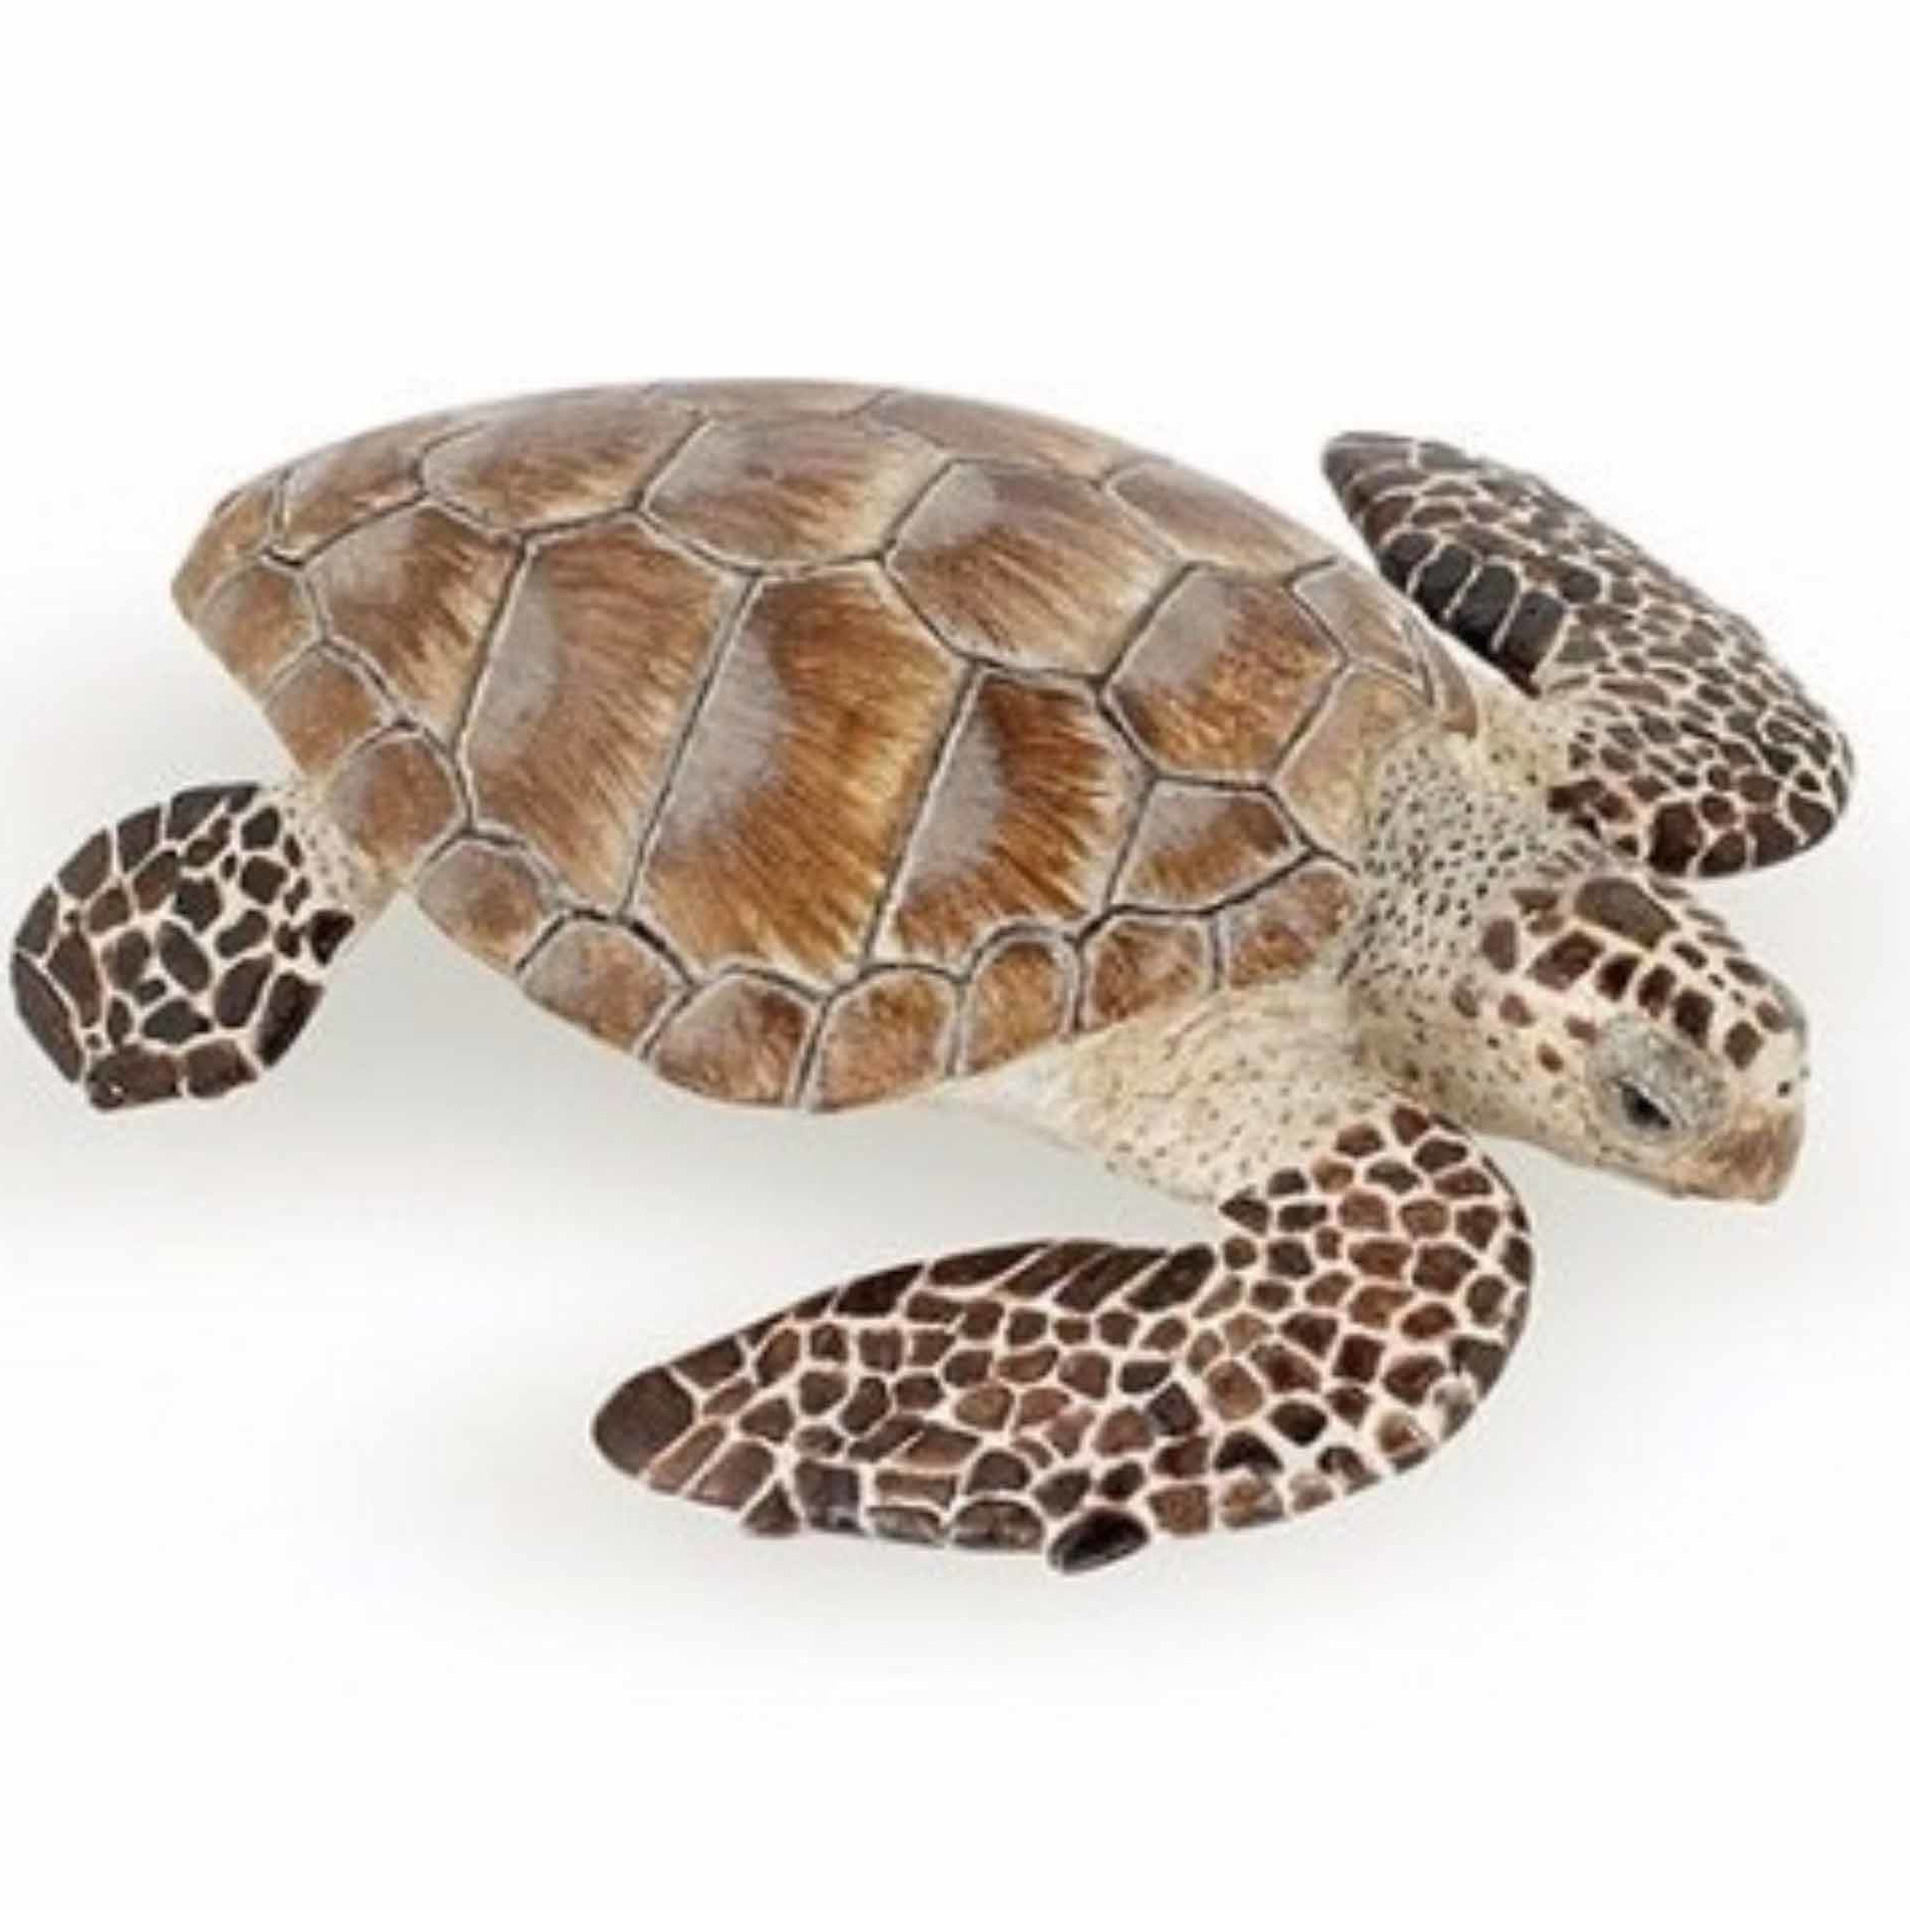 Plastic karetschildpad speeldiertje 7,5 cm (bron: Sinterklaas-feestwinkel)